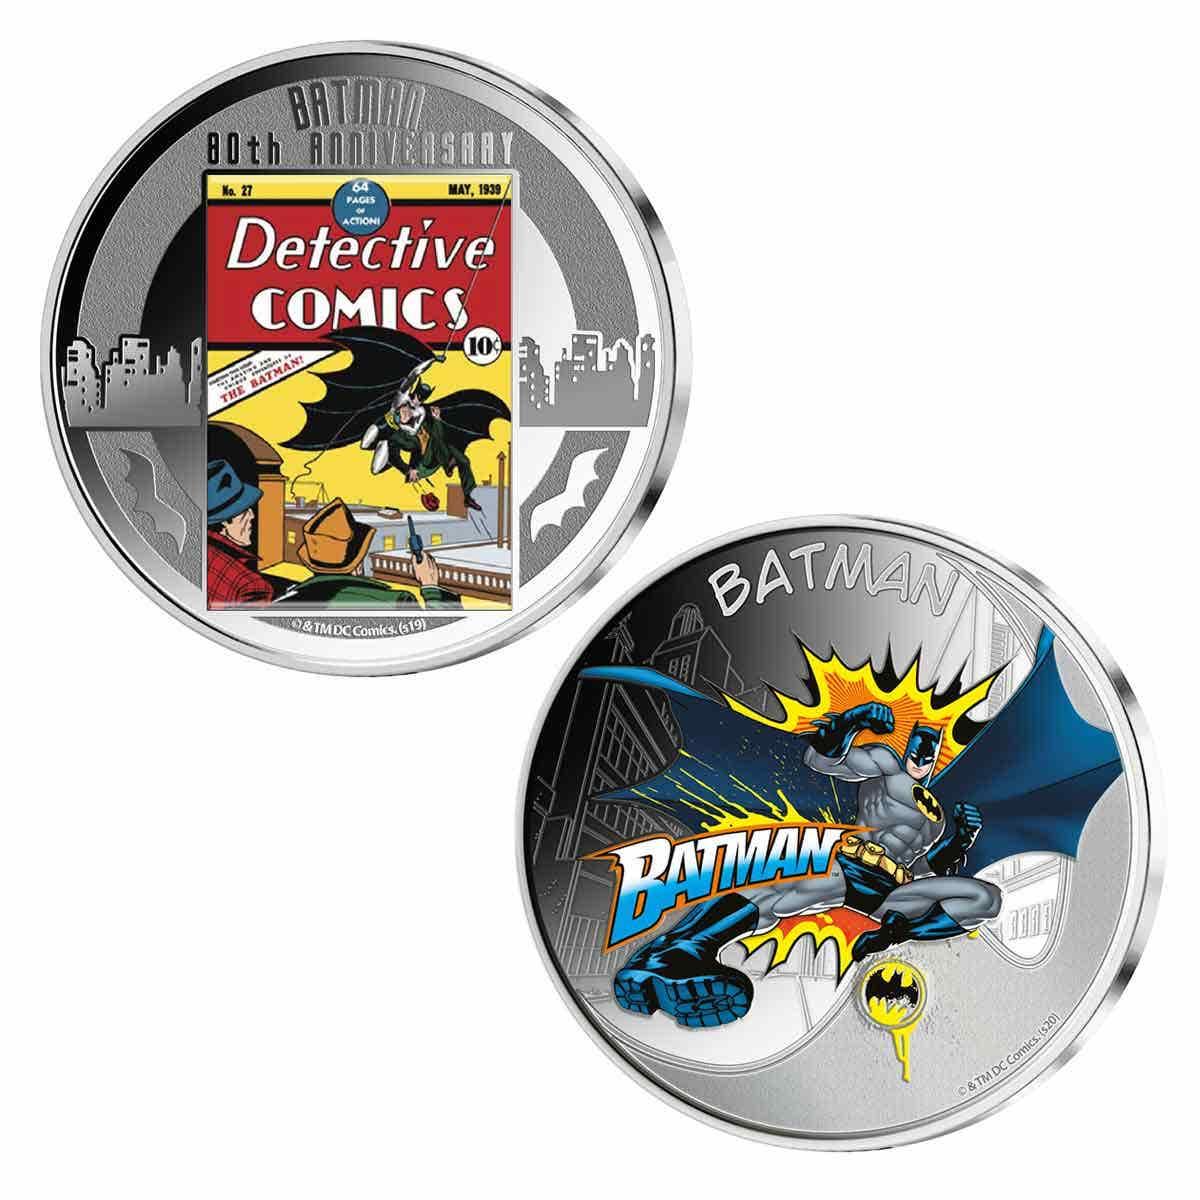 80 Years of Batman + Batman